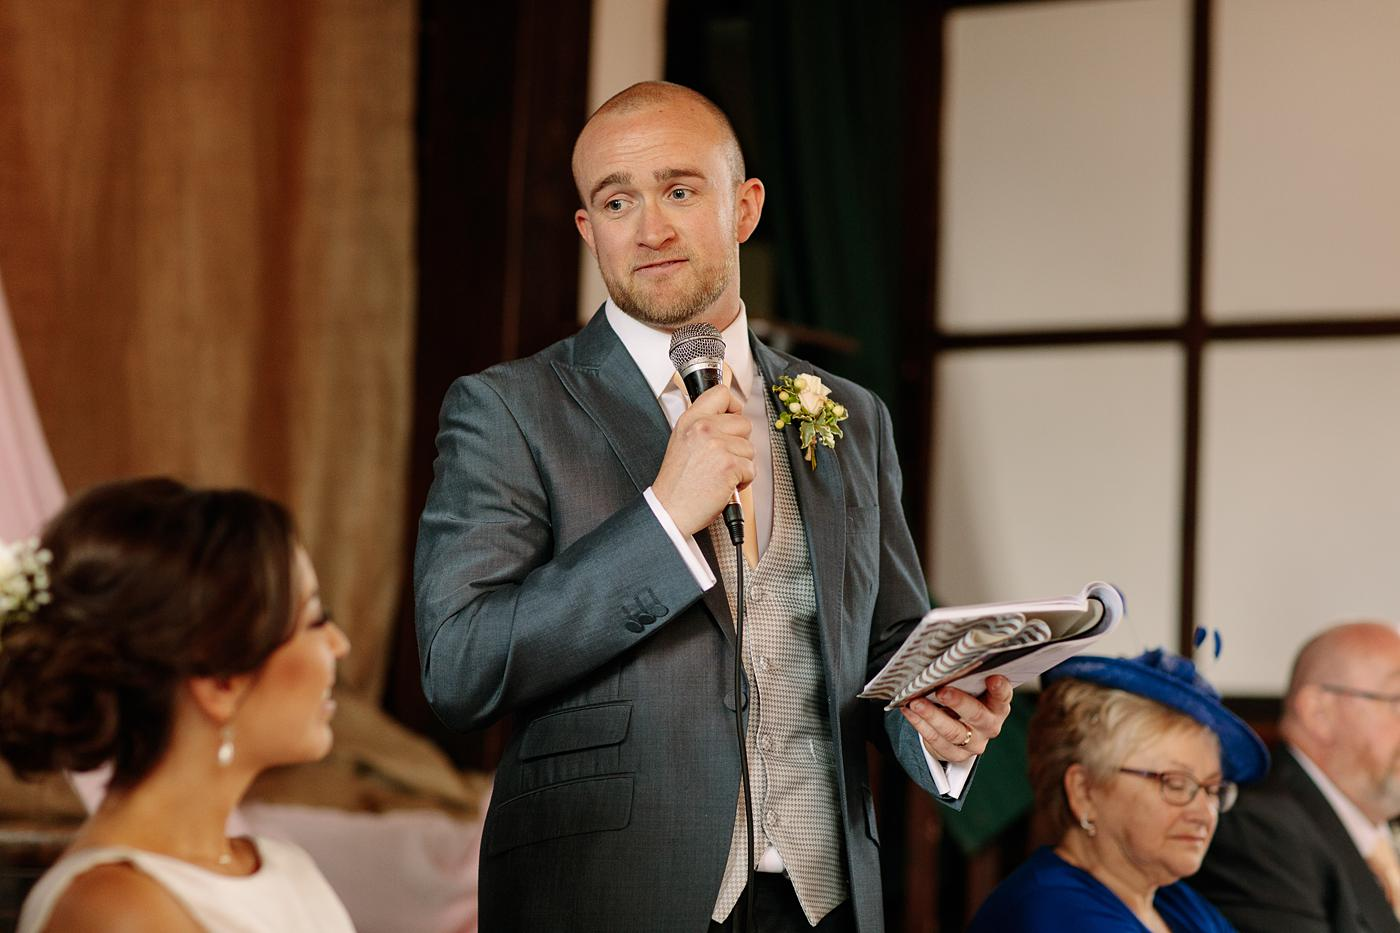 Winstanstow wedding photography 0846